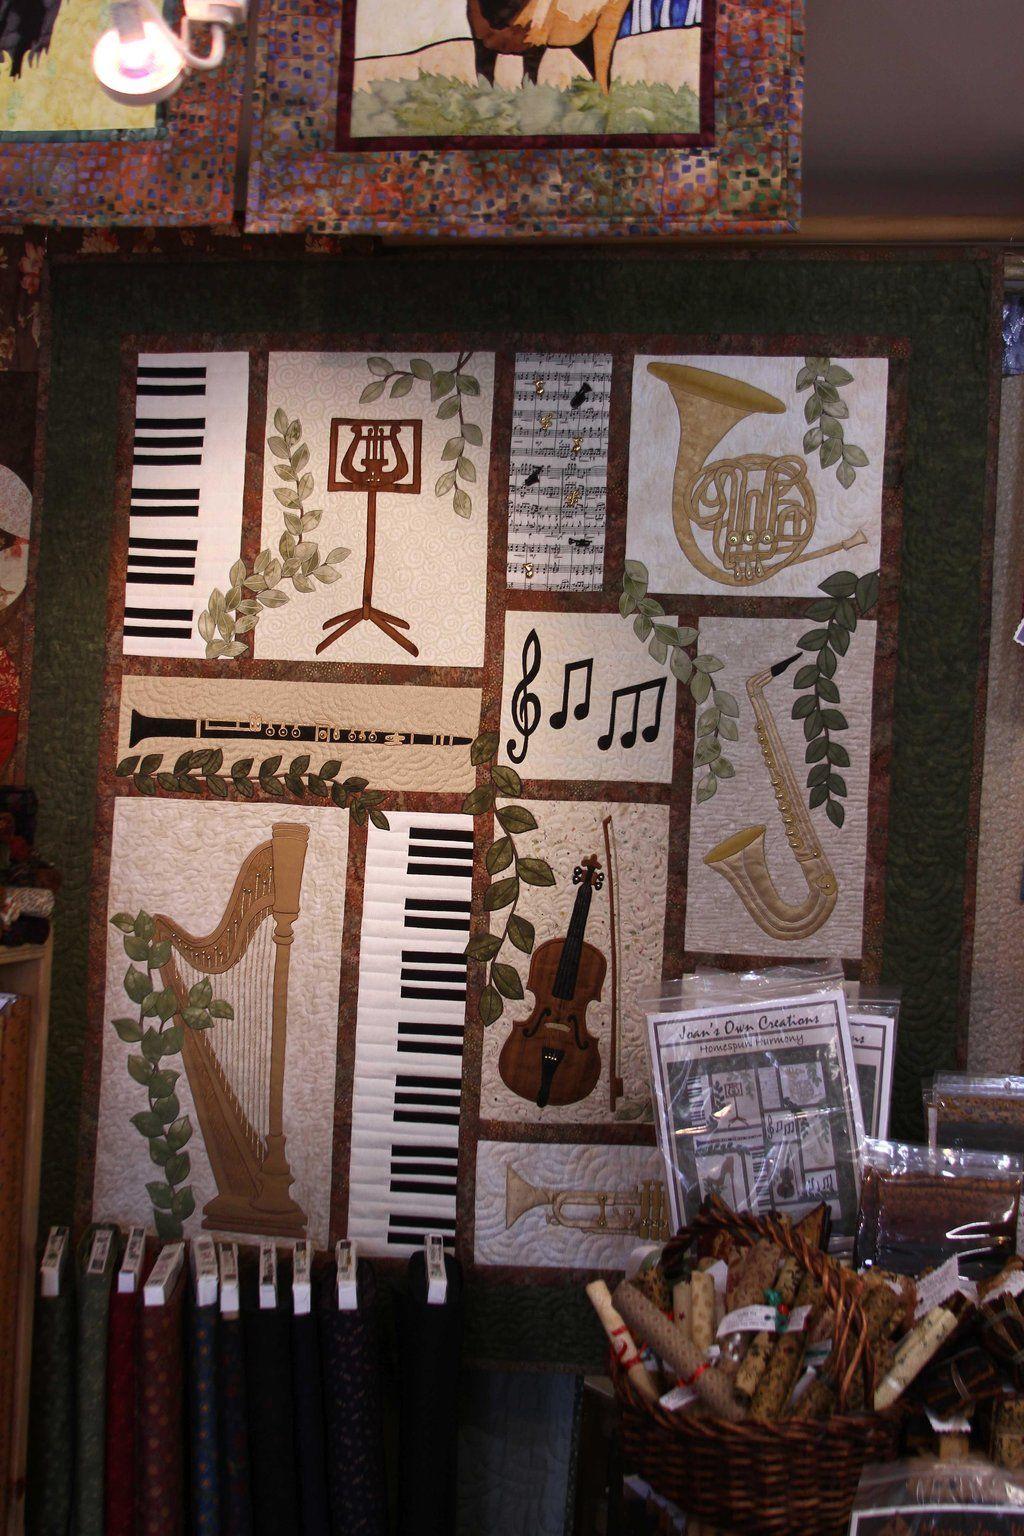 Impressive quilting shop, so much fabric! - Sugar Pine Company ... : sugar pine quilt shop - Adamdwight.com